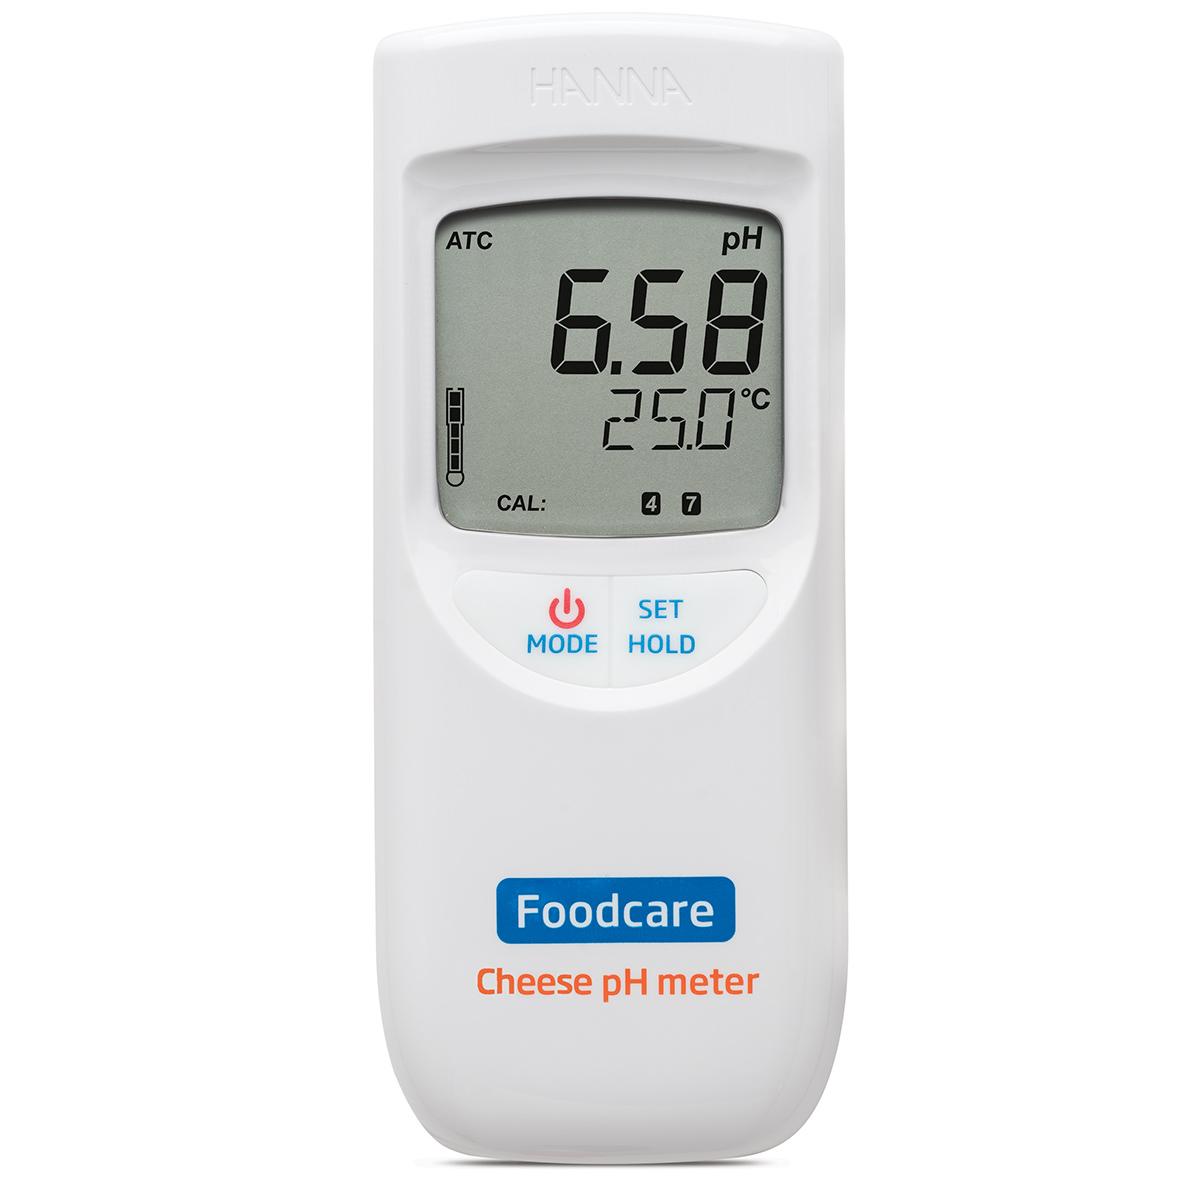 pHmetro portatile per analisi nei formaggi - HI99165